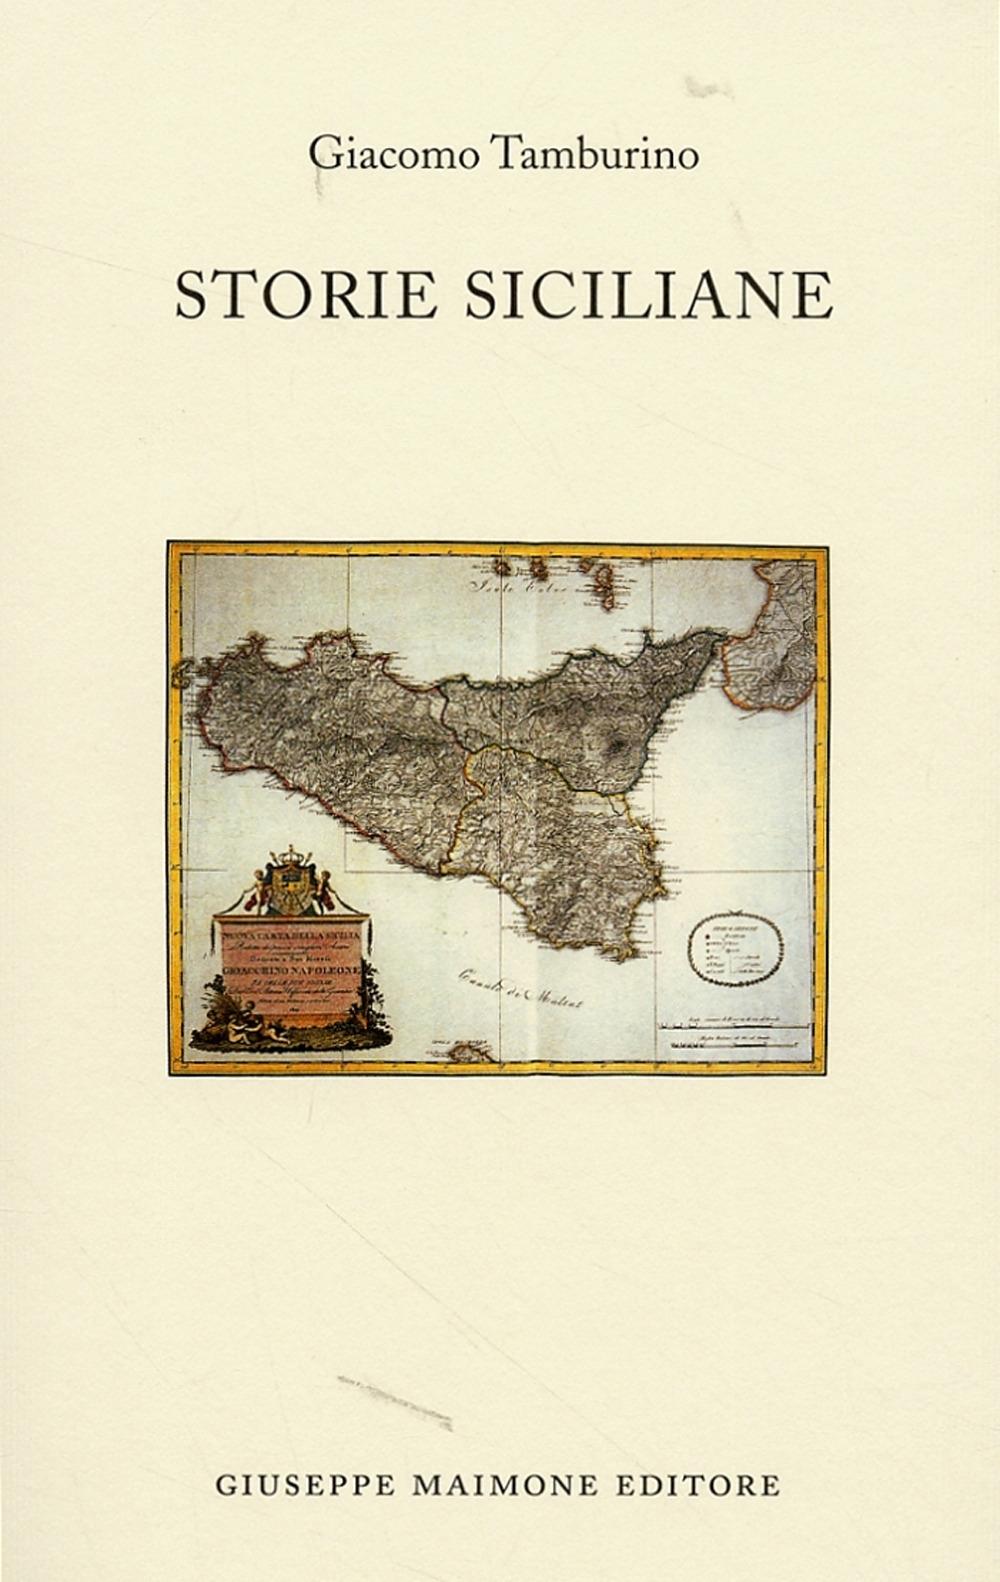 Storie siciliane